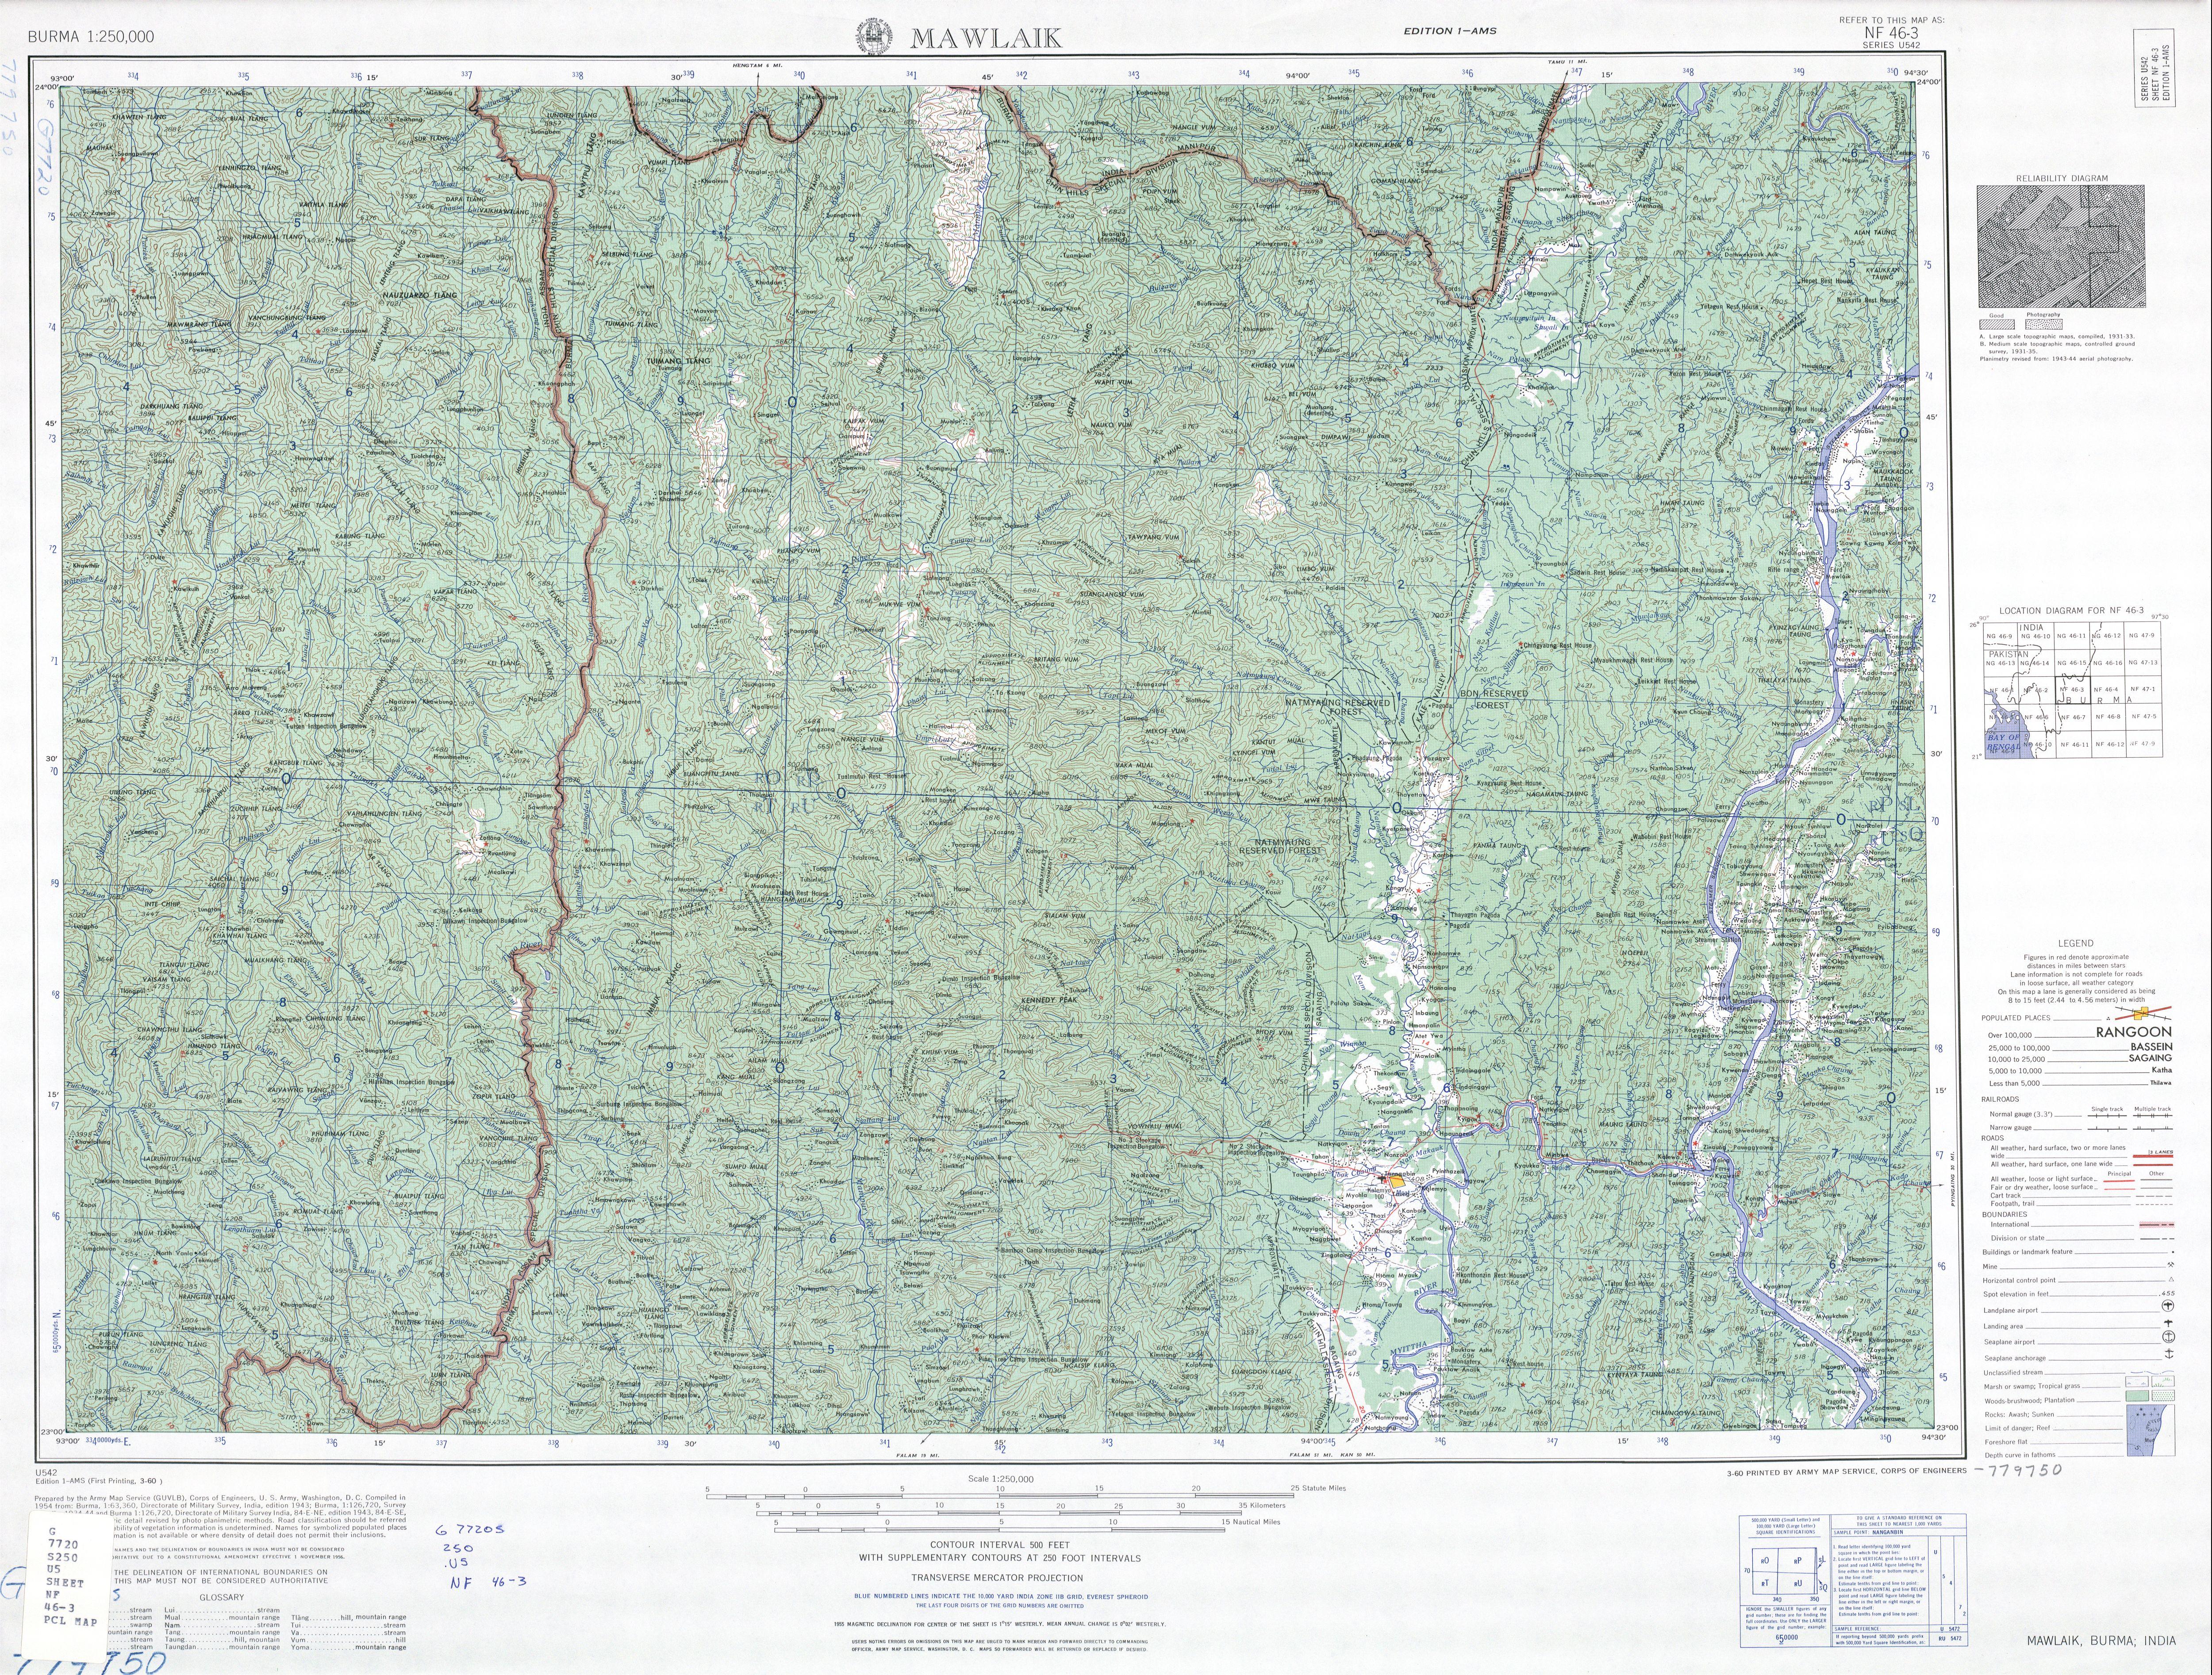 Yangon Map State on bumthang map, hong kong map, yangtze river map, taiohae map, jakarta map, myanmar map, murang'a map, bandar seri begawan map, rangoon map, burma map, bangkok map, mekong river map, hanoi map, manila map, islamabad map, great wall of china map, naypyidaw map, taipei map, vientiane map, kuala lumpur map,